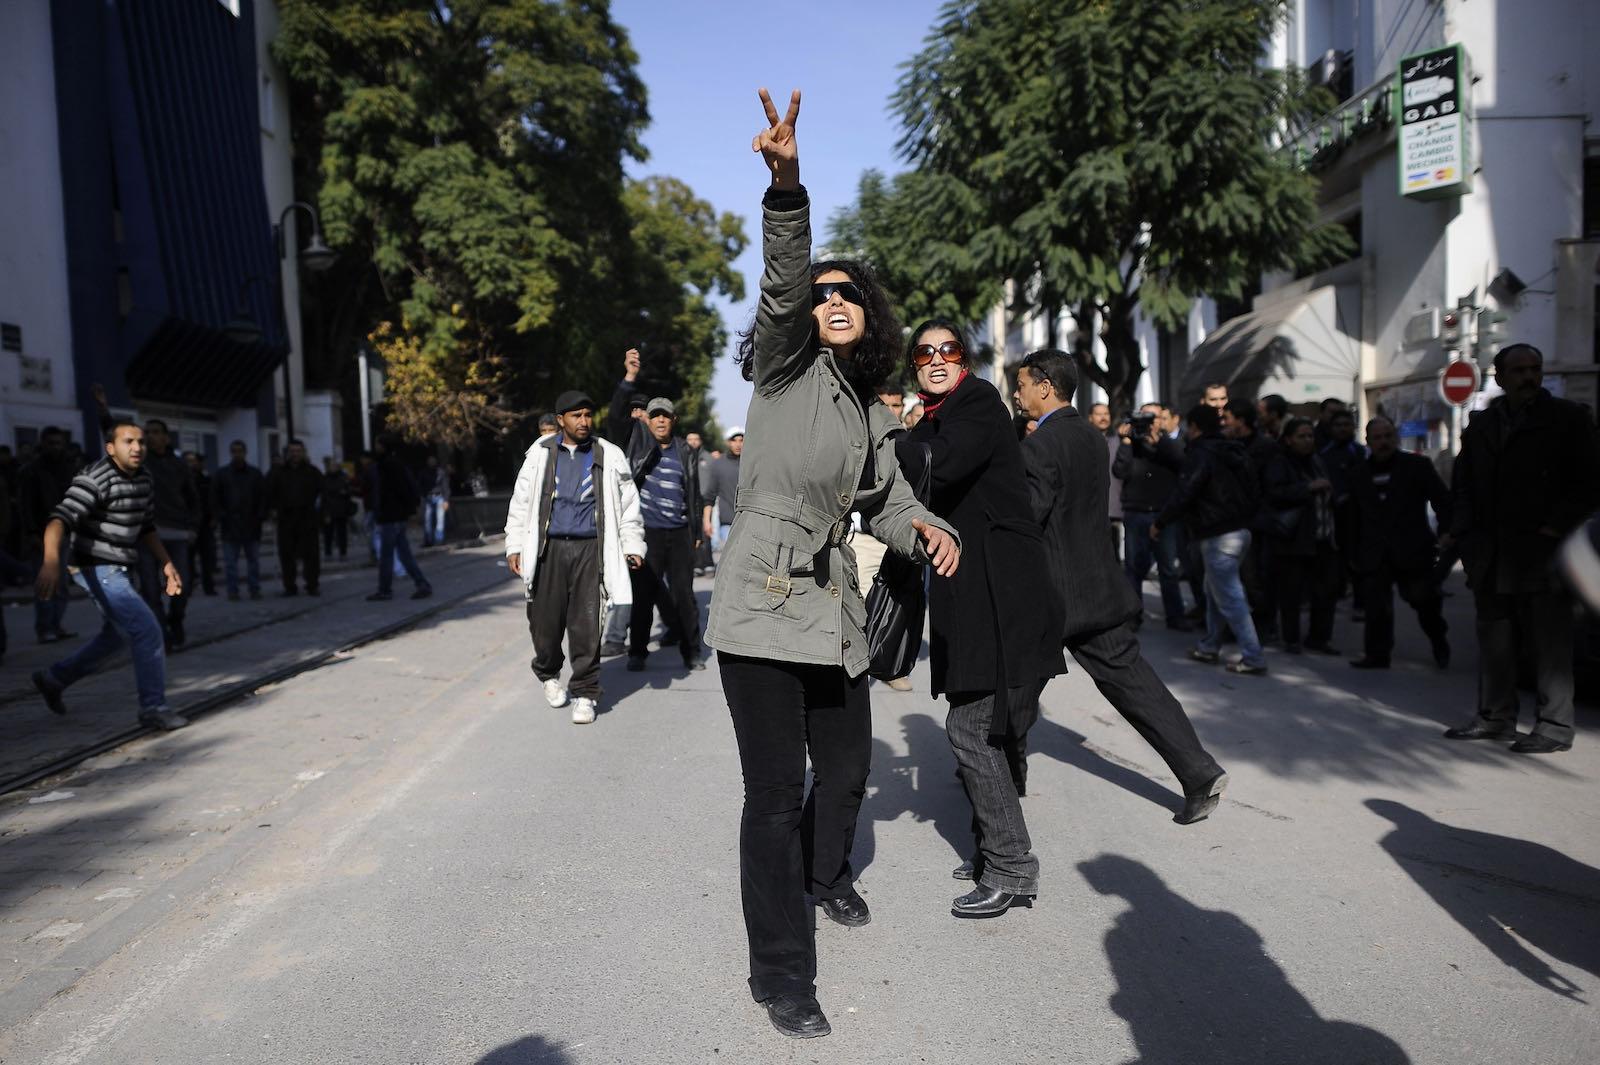 A Tunisian demonstrator gesturing